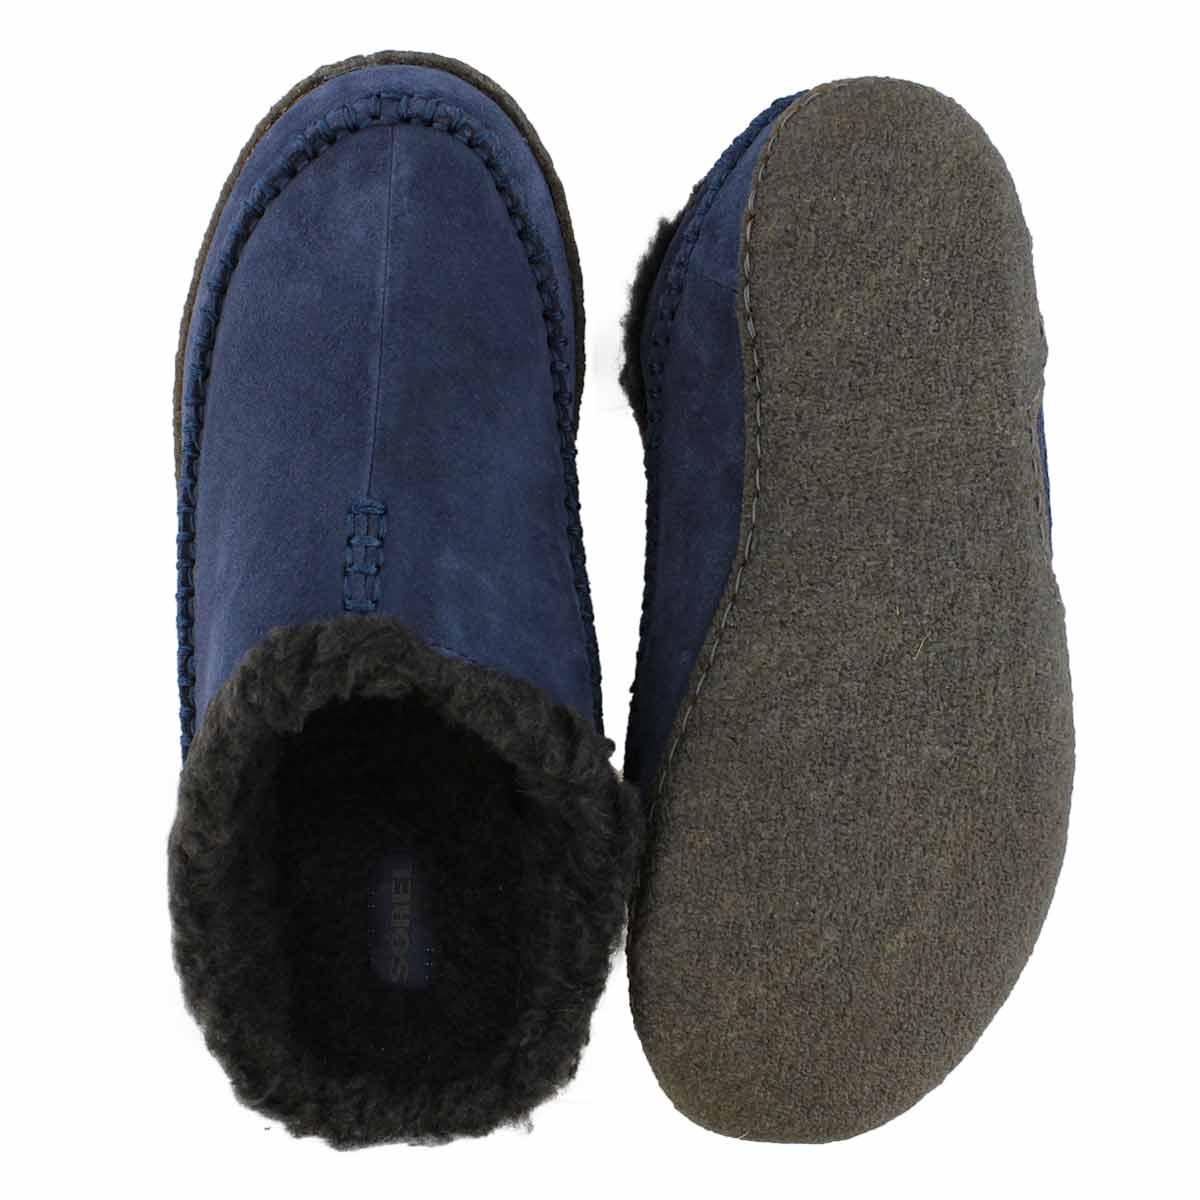 Mns Falcon Ridge nocturnal open slipper